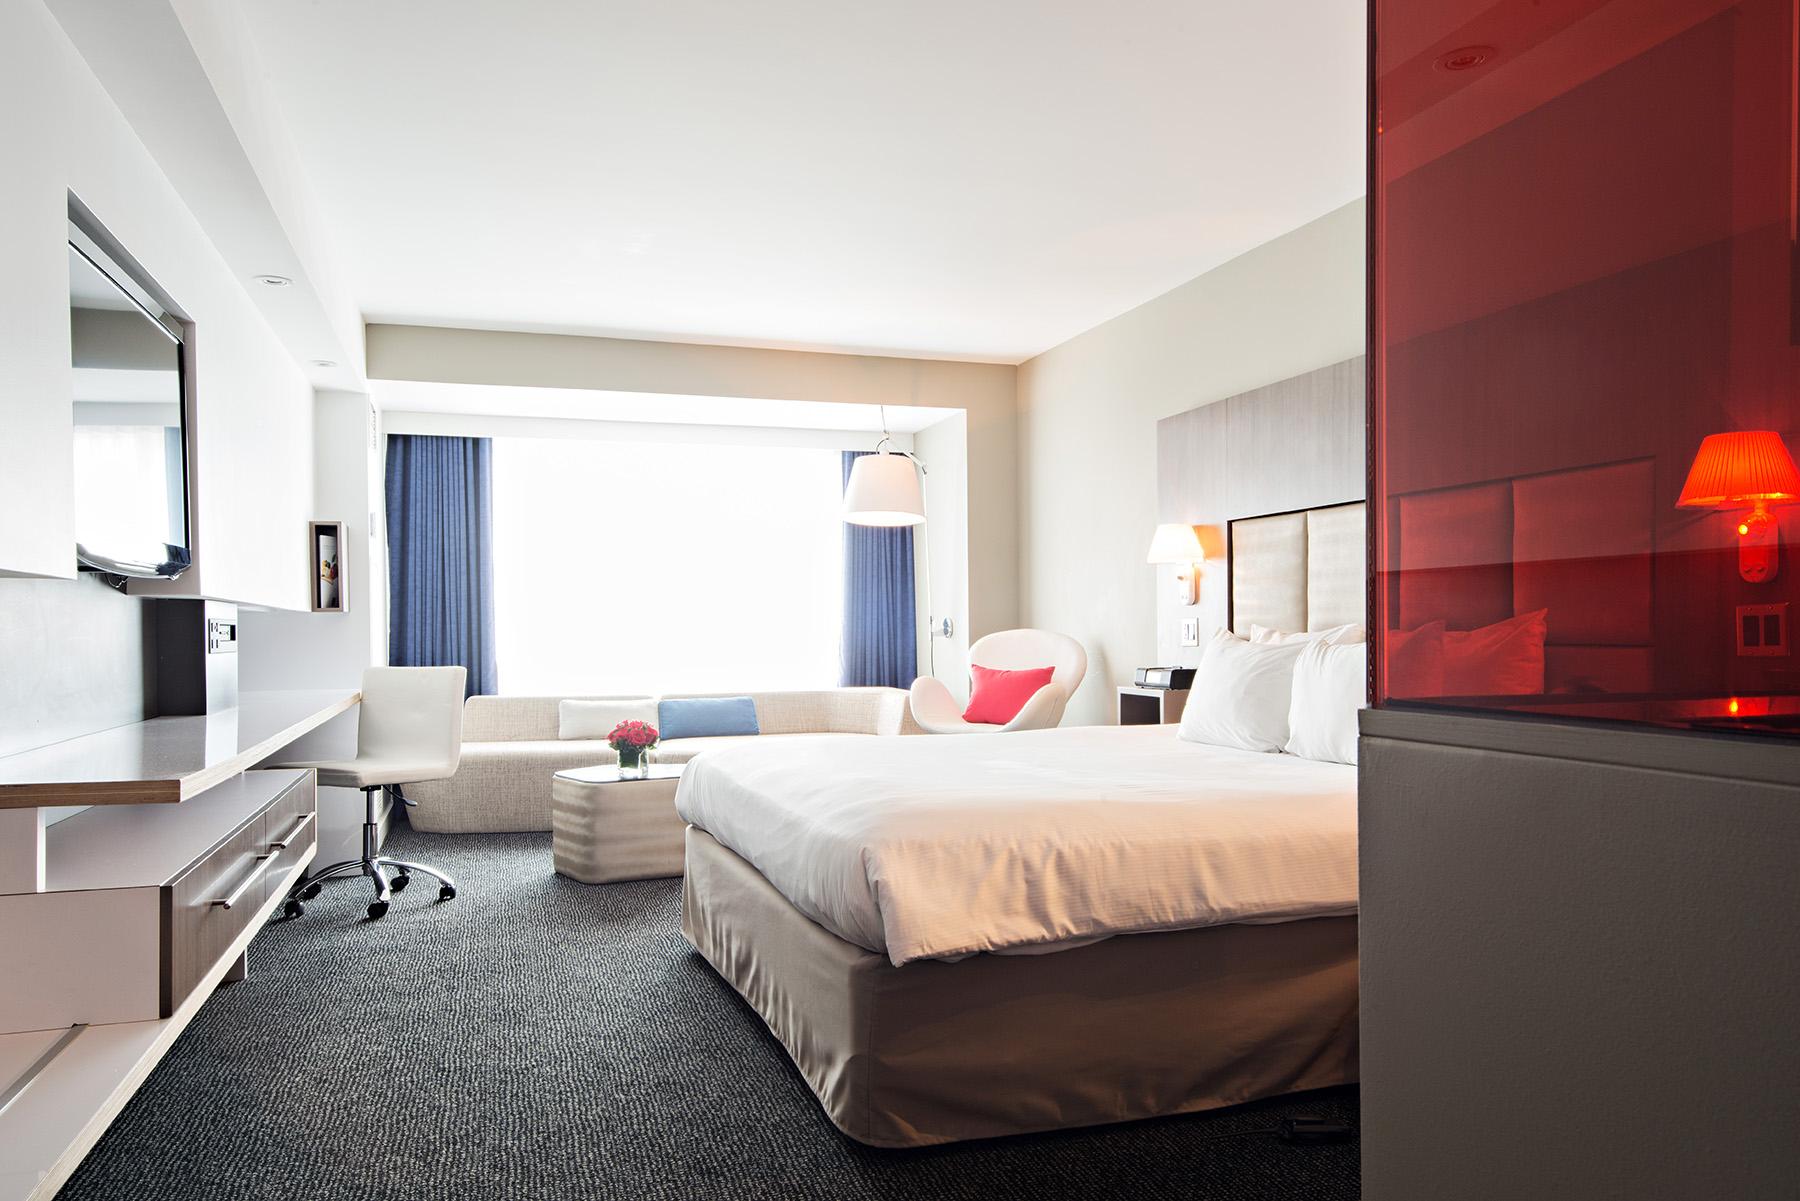 interiors-hospitality-lifestyle-novotel-hotel-montreal-005